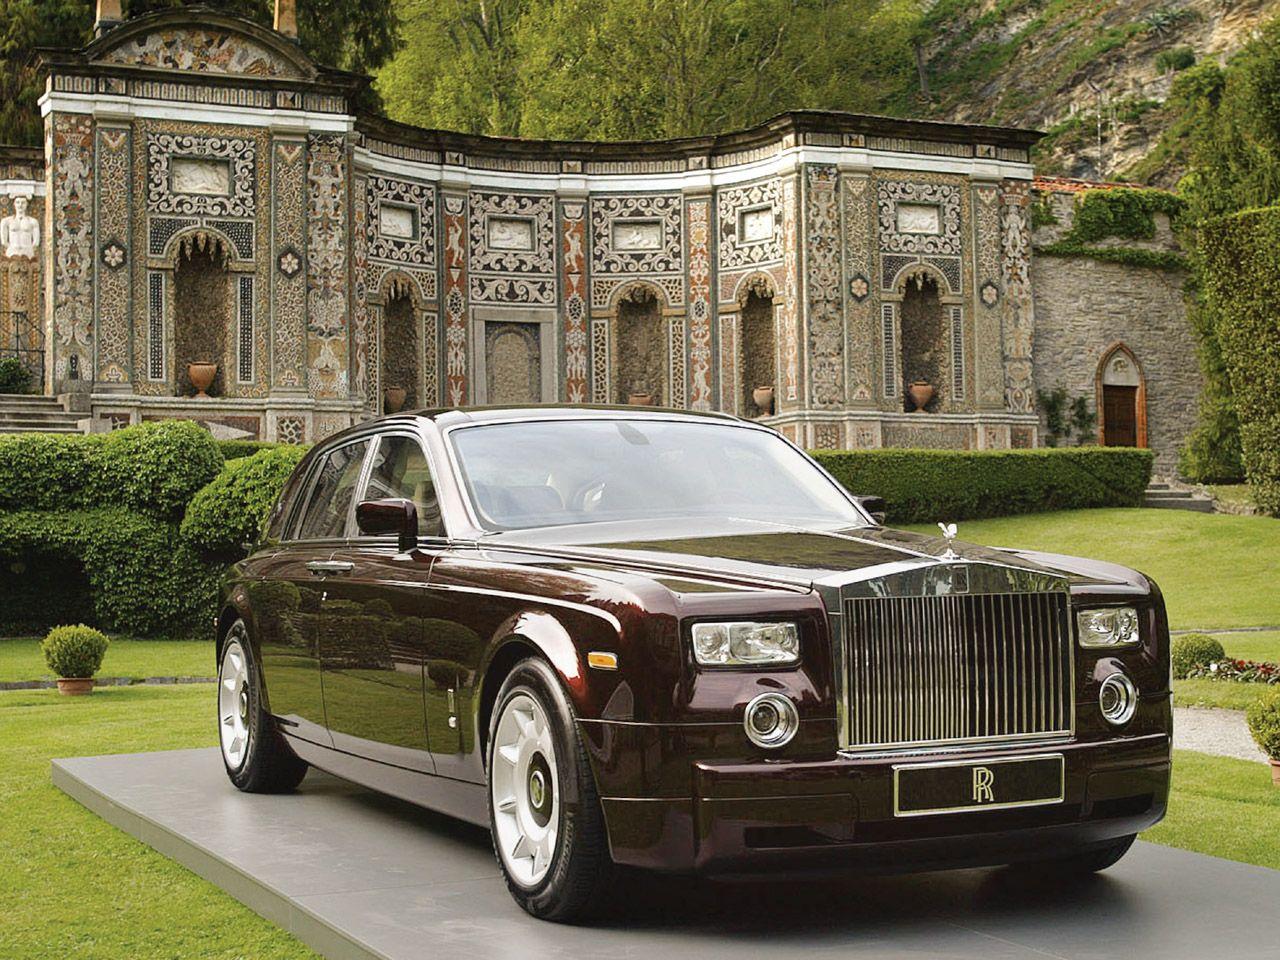 Ultimate Rolls Royce With 9 0 Liter V16 Engine Rolls Royce Phantom Rolls Royce Cars Rolls Royce